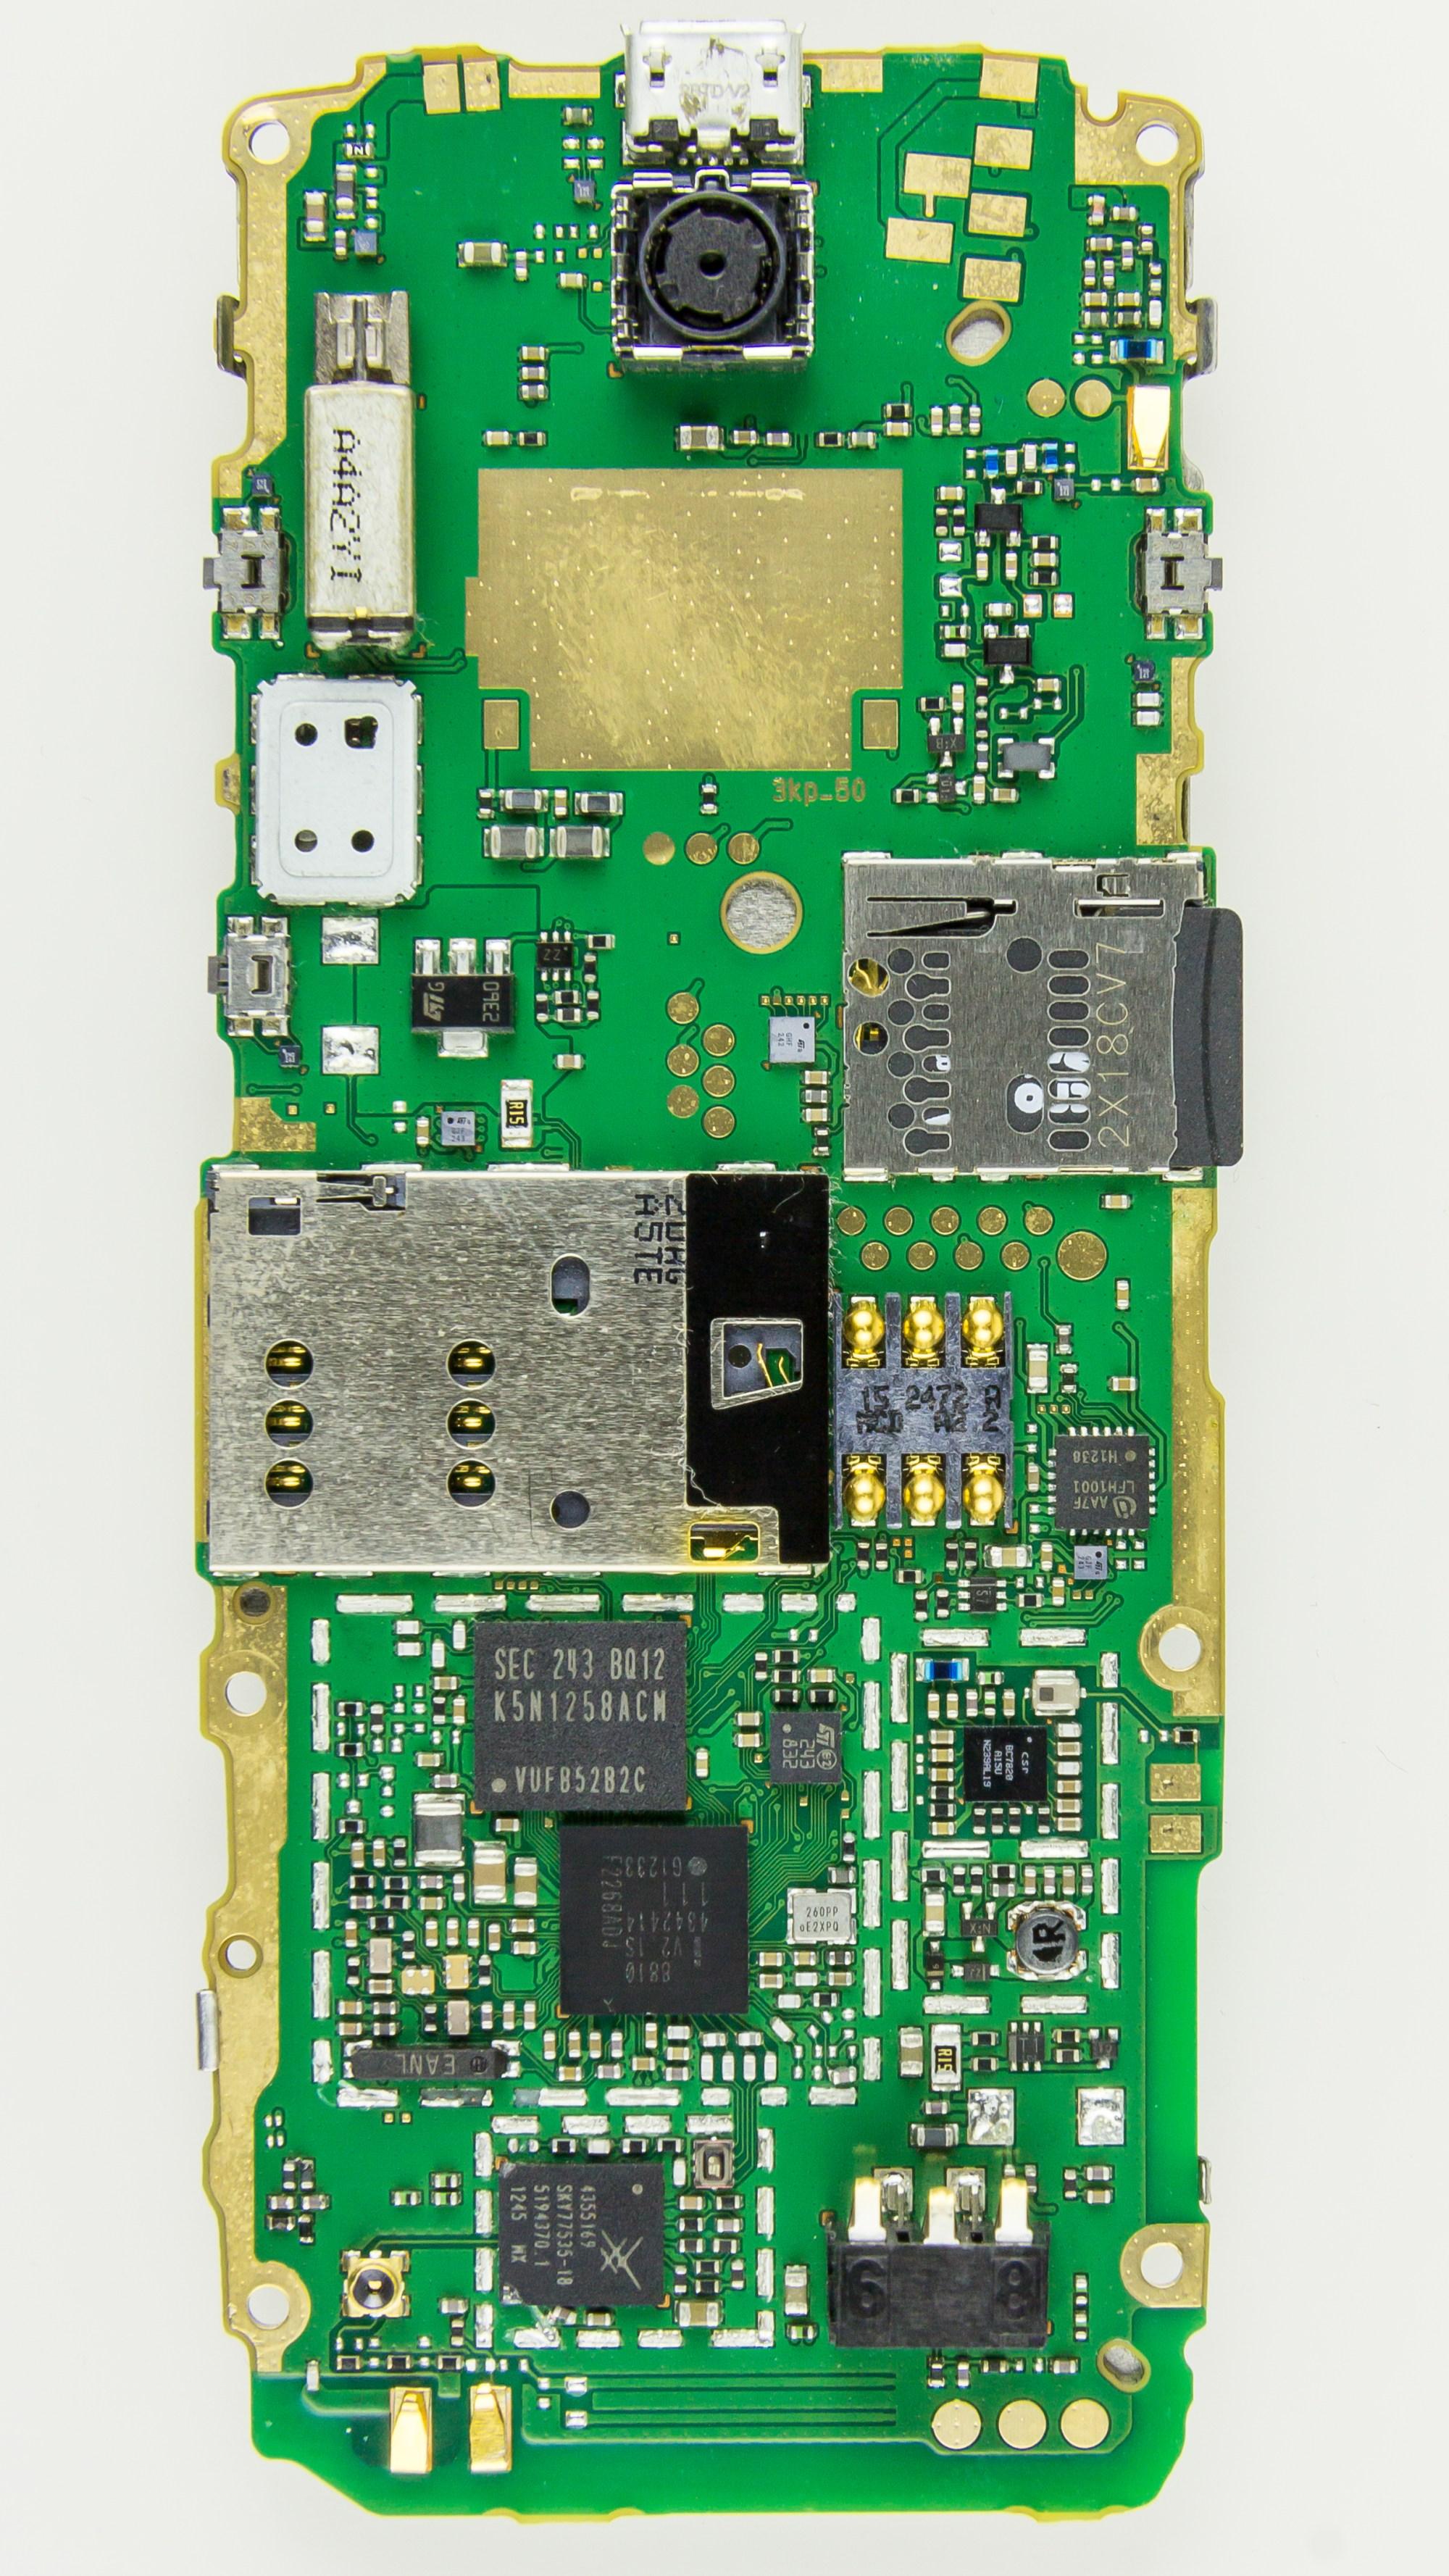 hight resolution of file nokia x2 02 printed circuit board 1141 jpg wikimedia commons circuit diagram of nokia x2 02